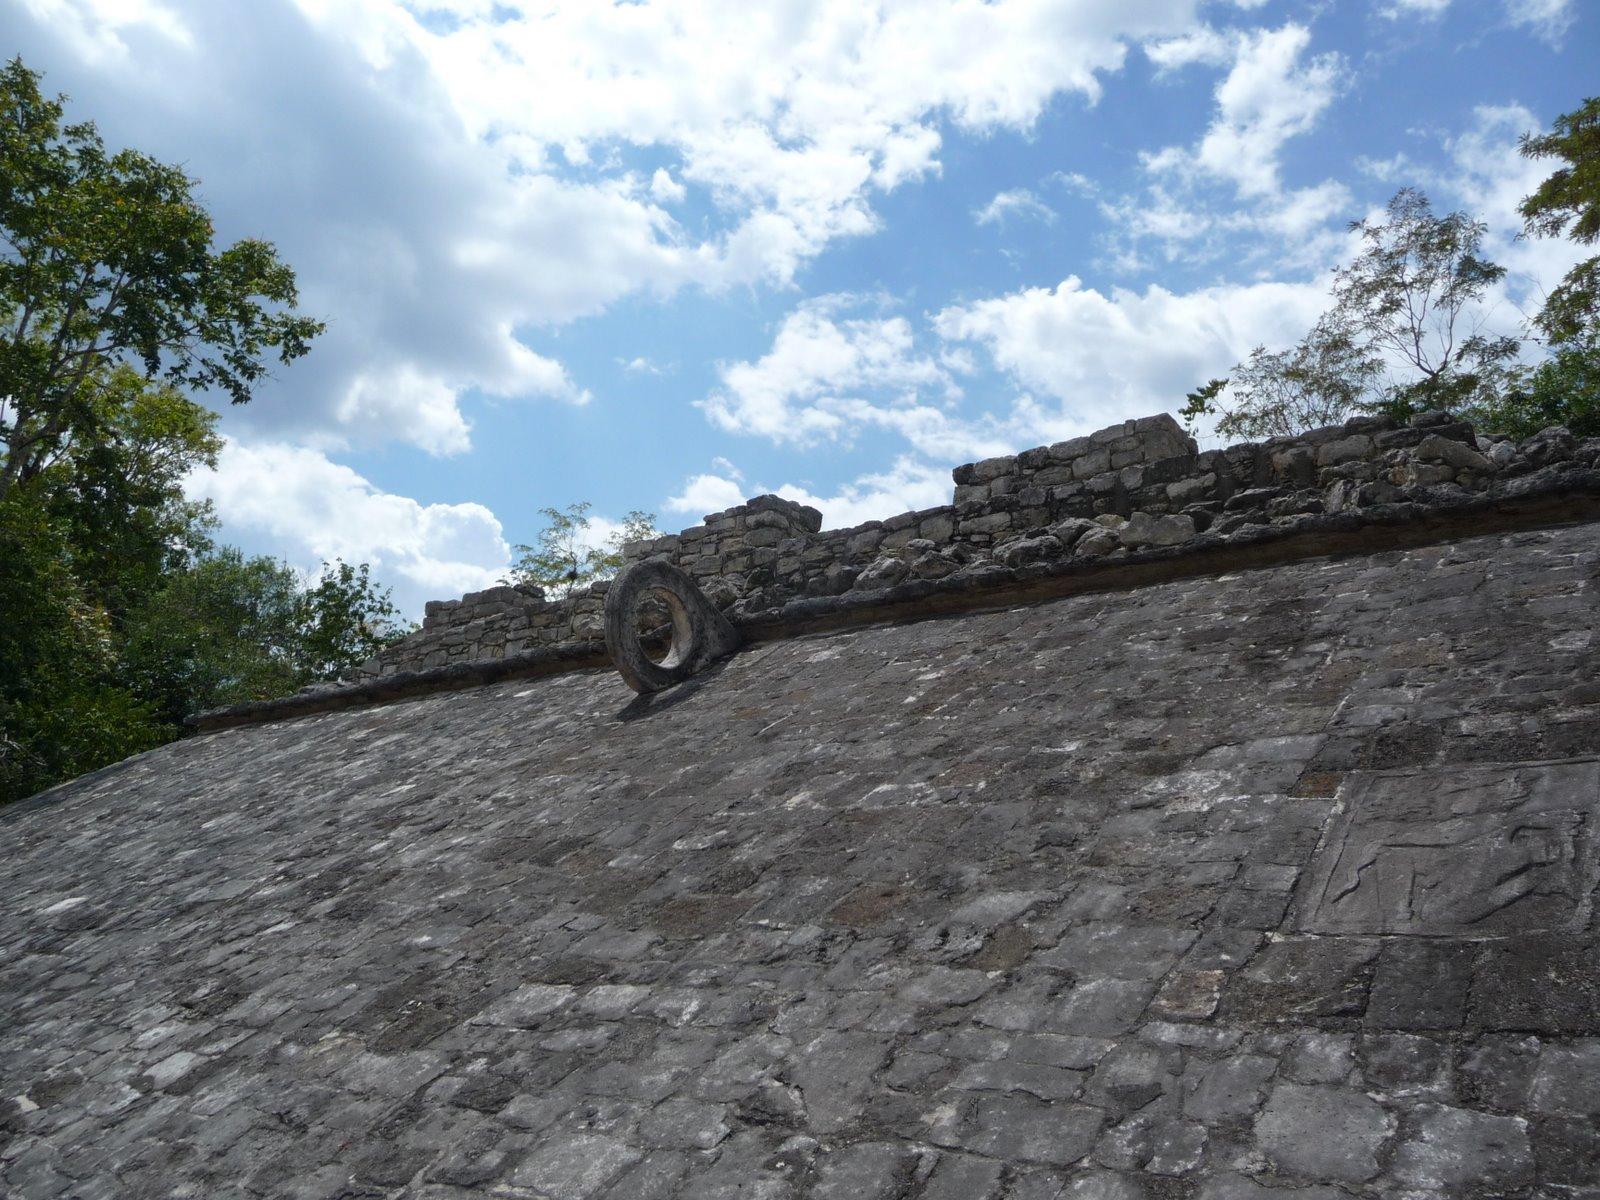 Pok Ta Pok: Mayan Basketball | Erica Swallow's Blog